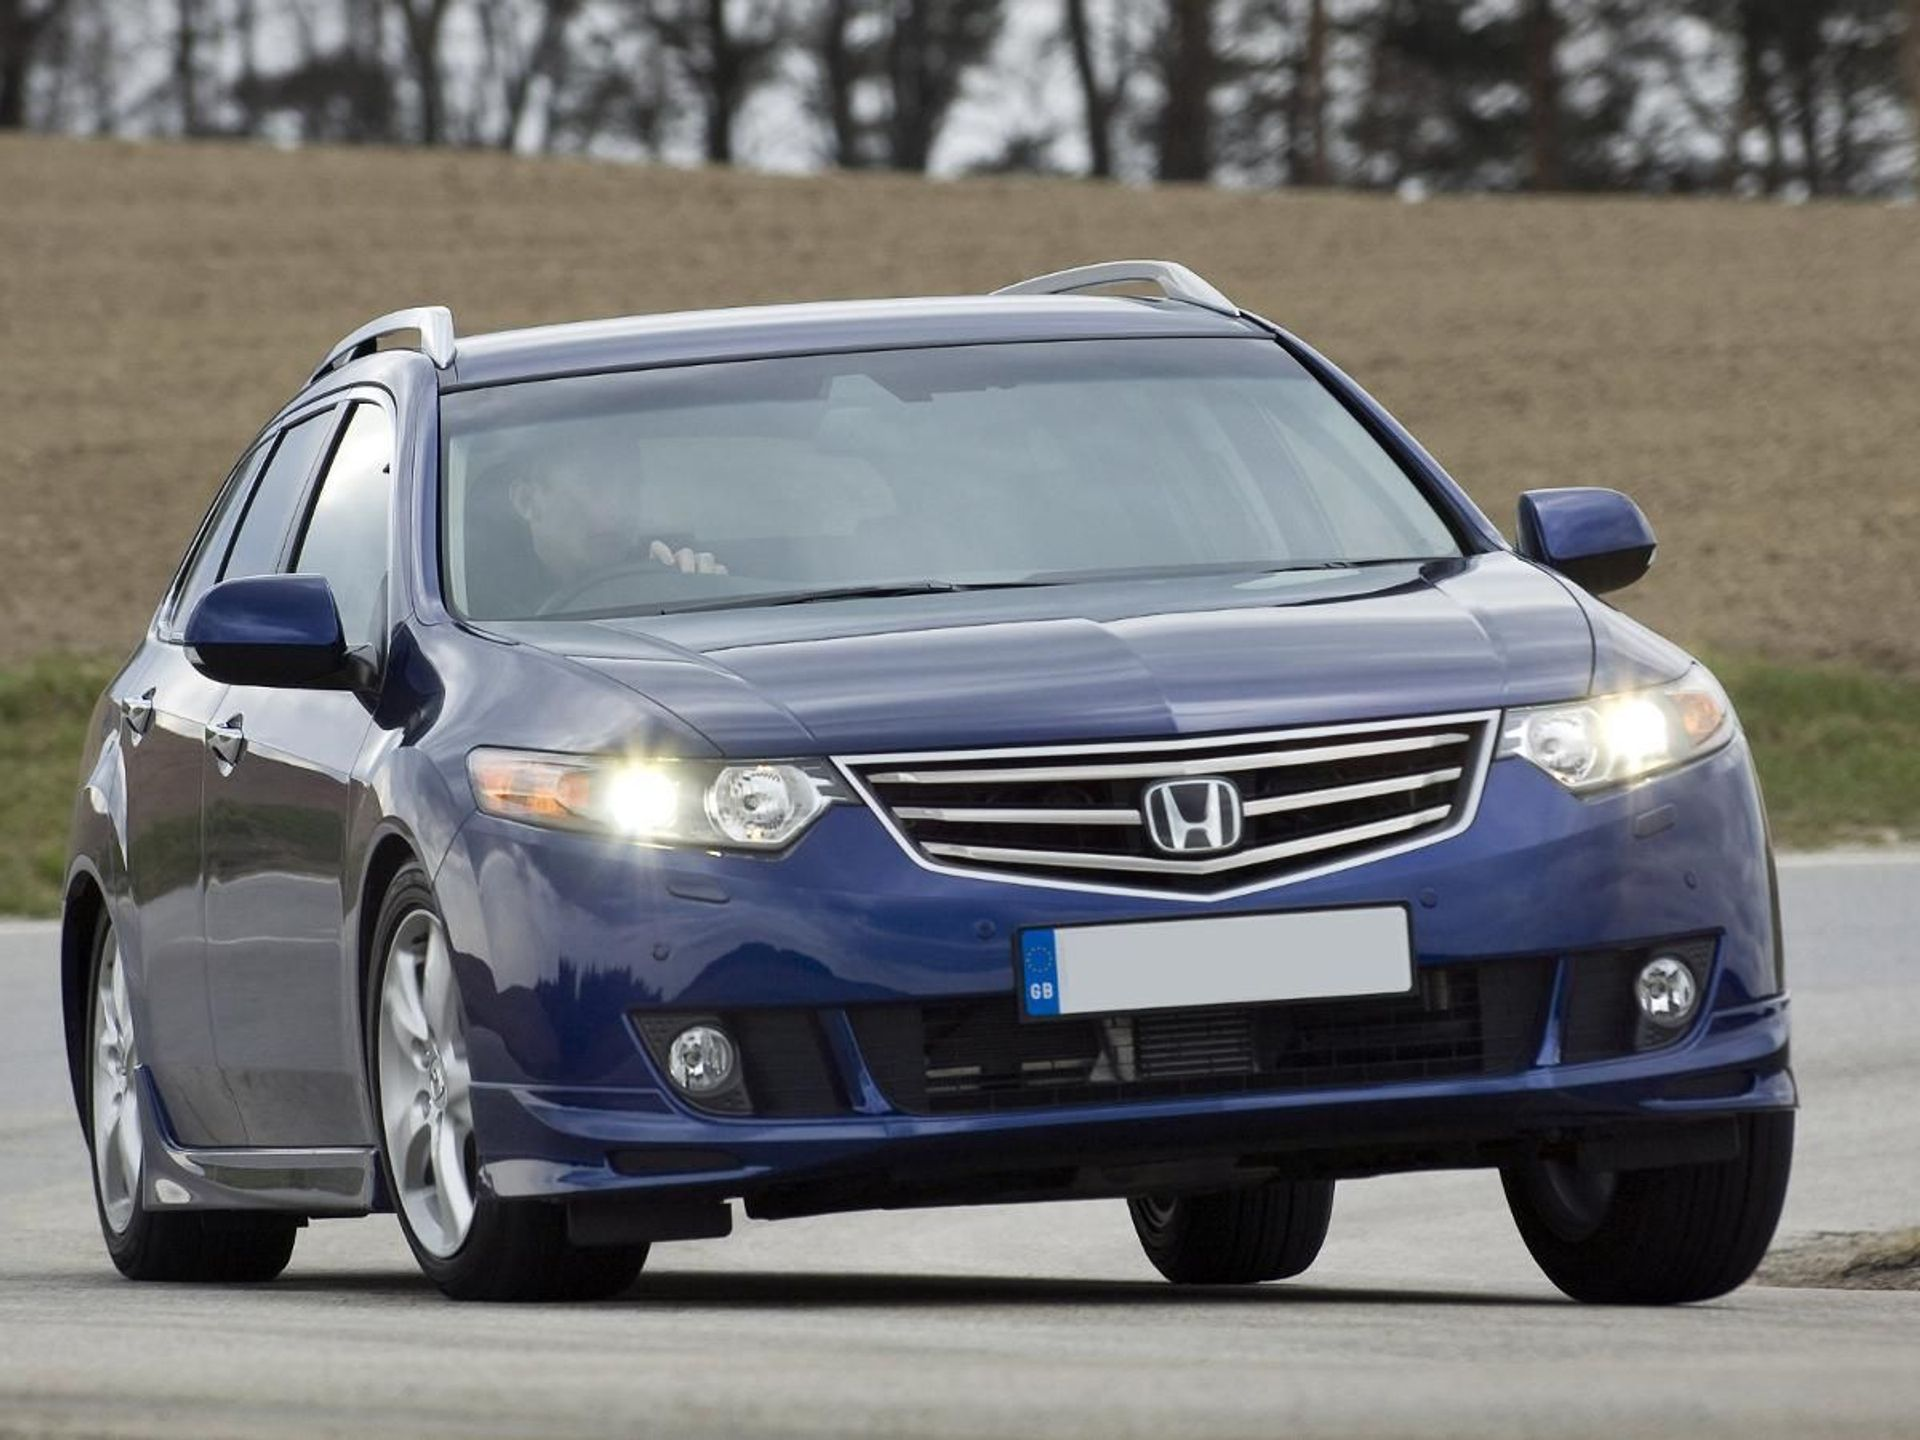 Honda Accord i image